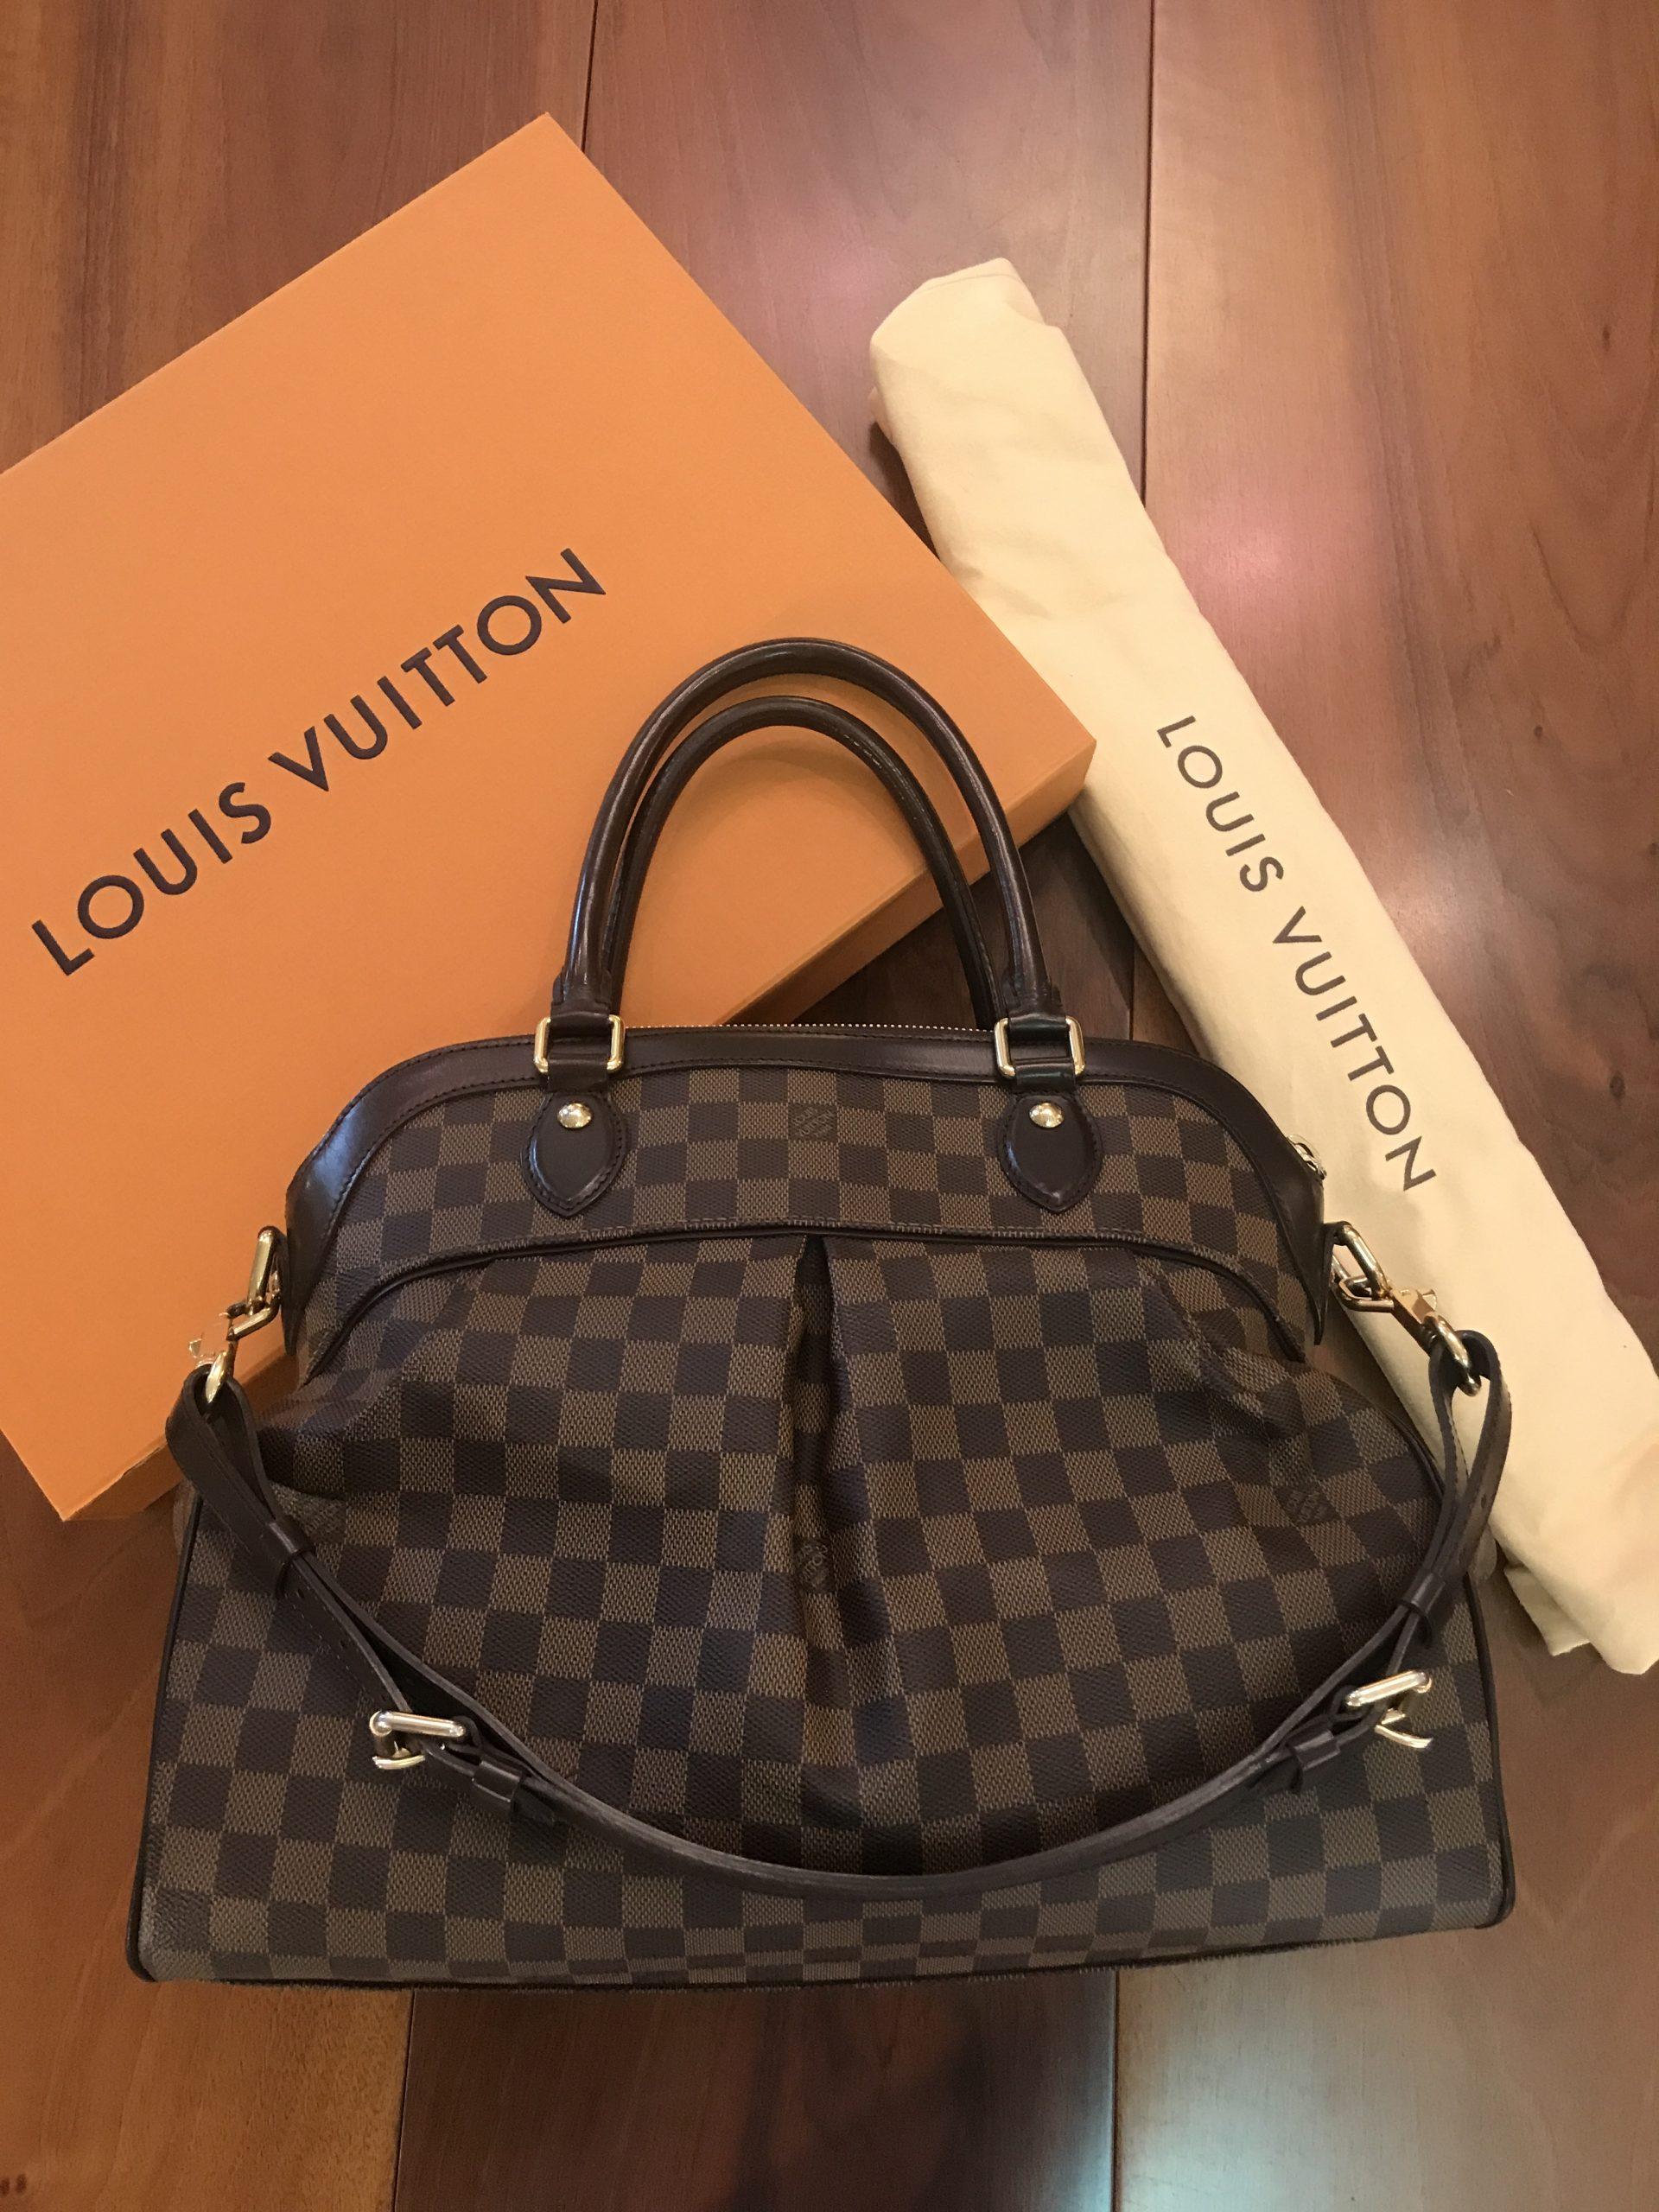 Louis Vuitton modello Trevi Gm Damier Ebene con Tracolla